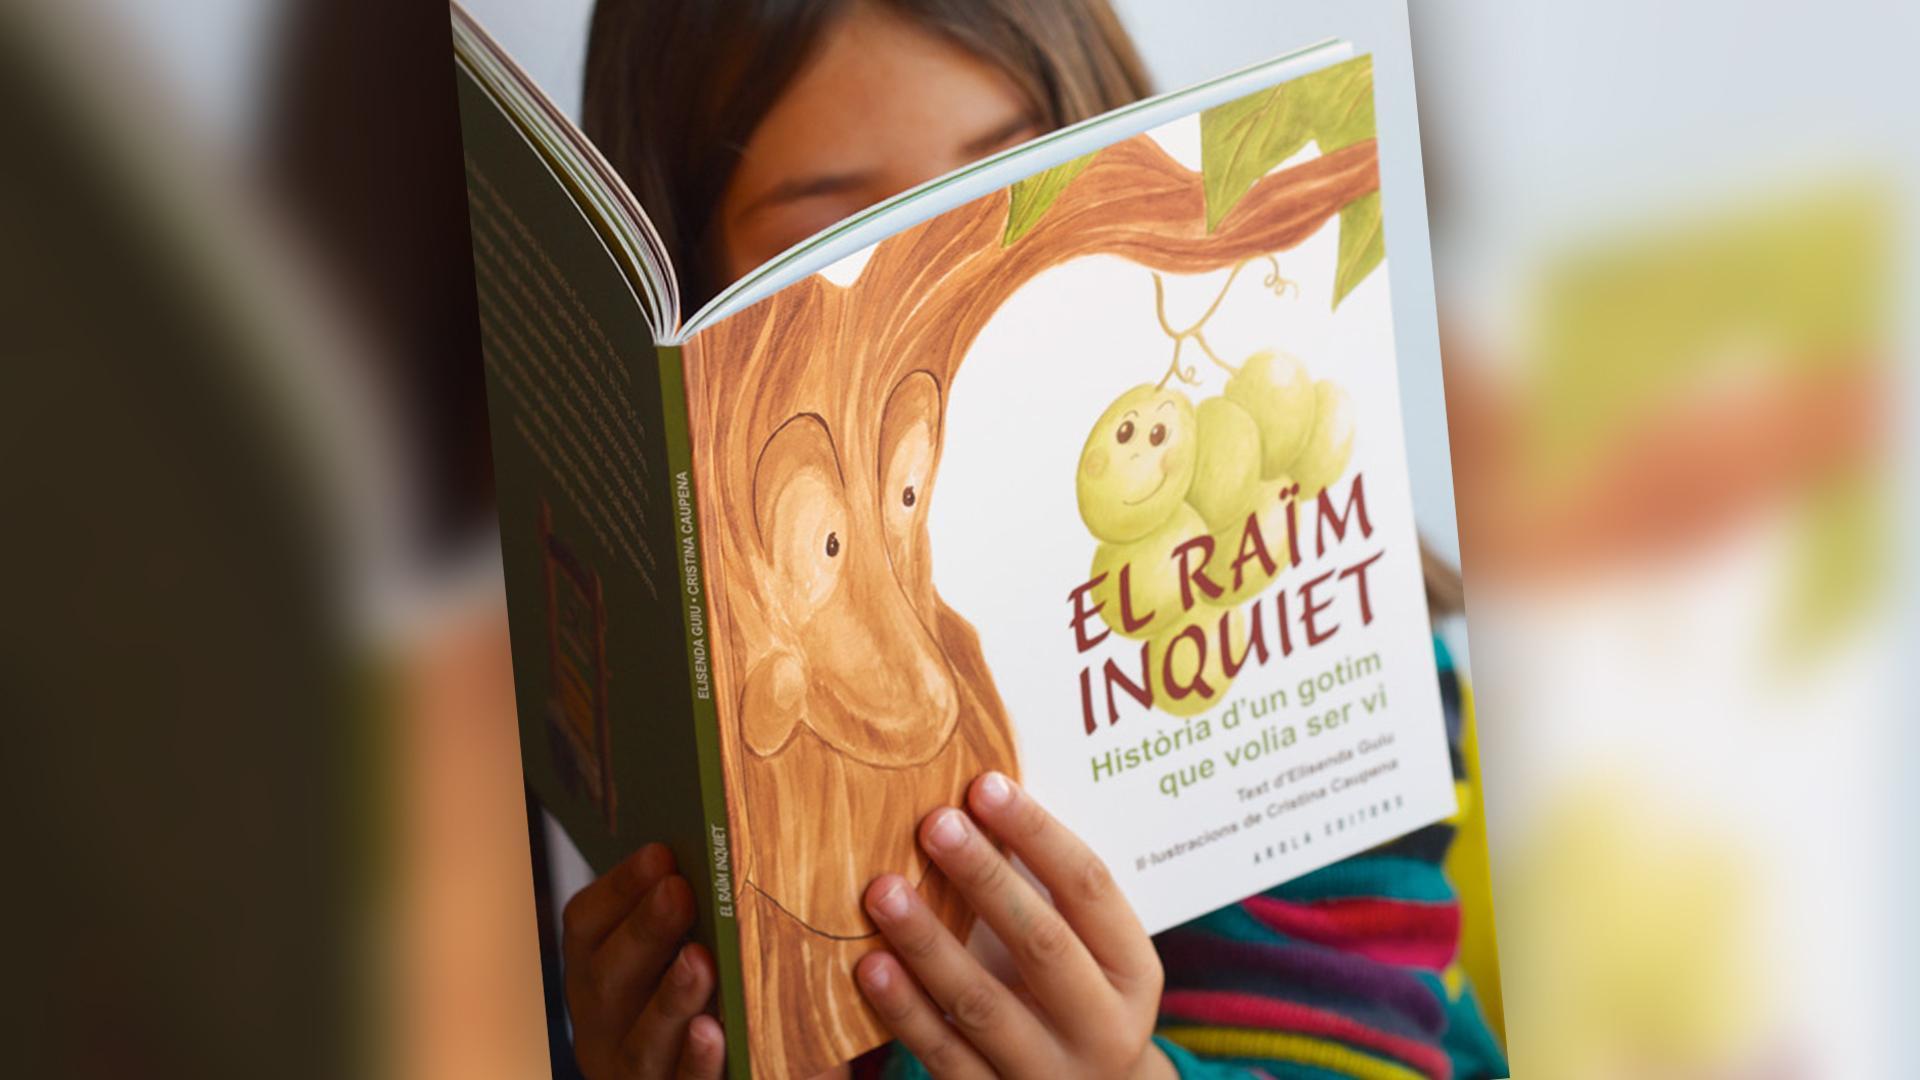 Biblioteca Pere Anguera: Contes a cau d'orella -